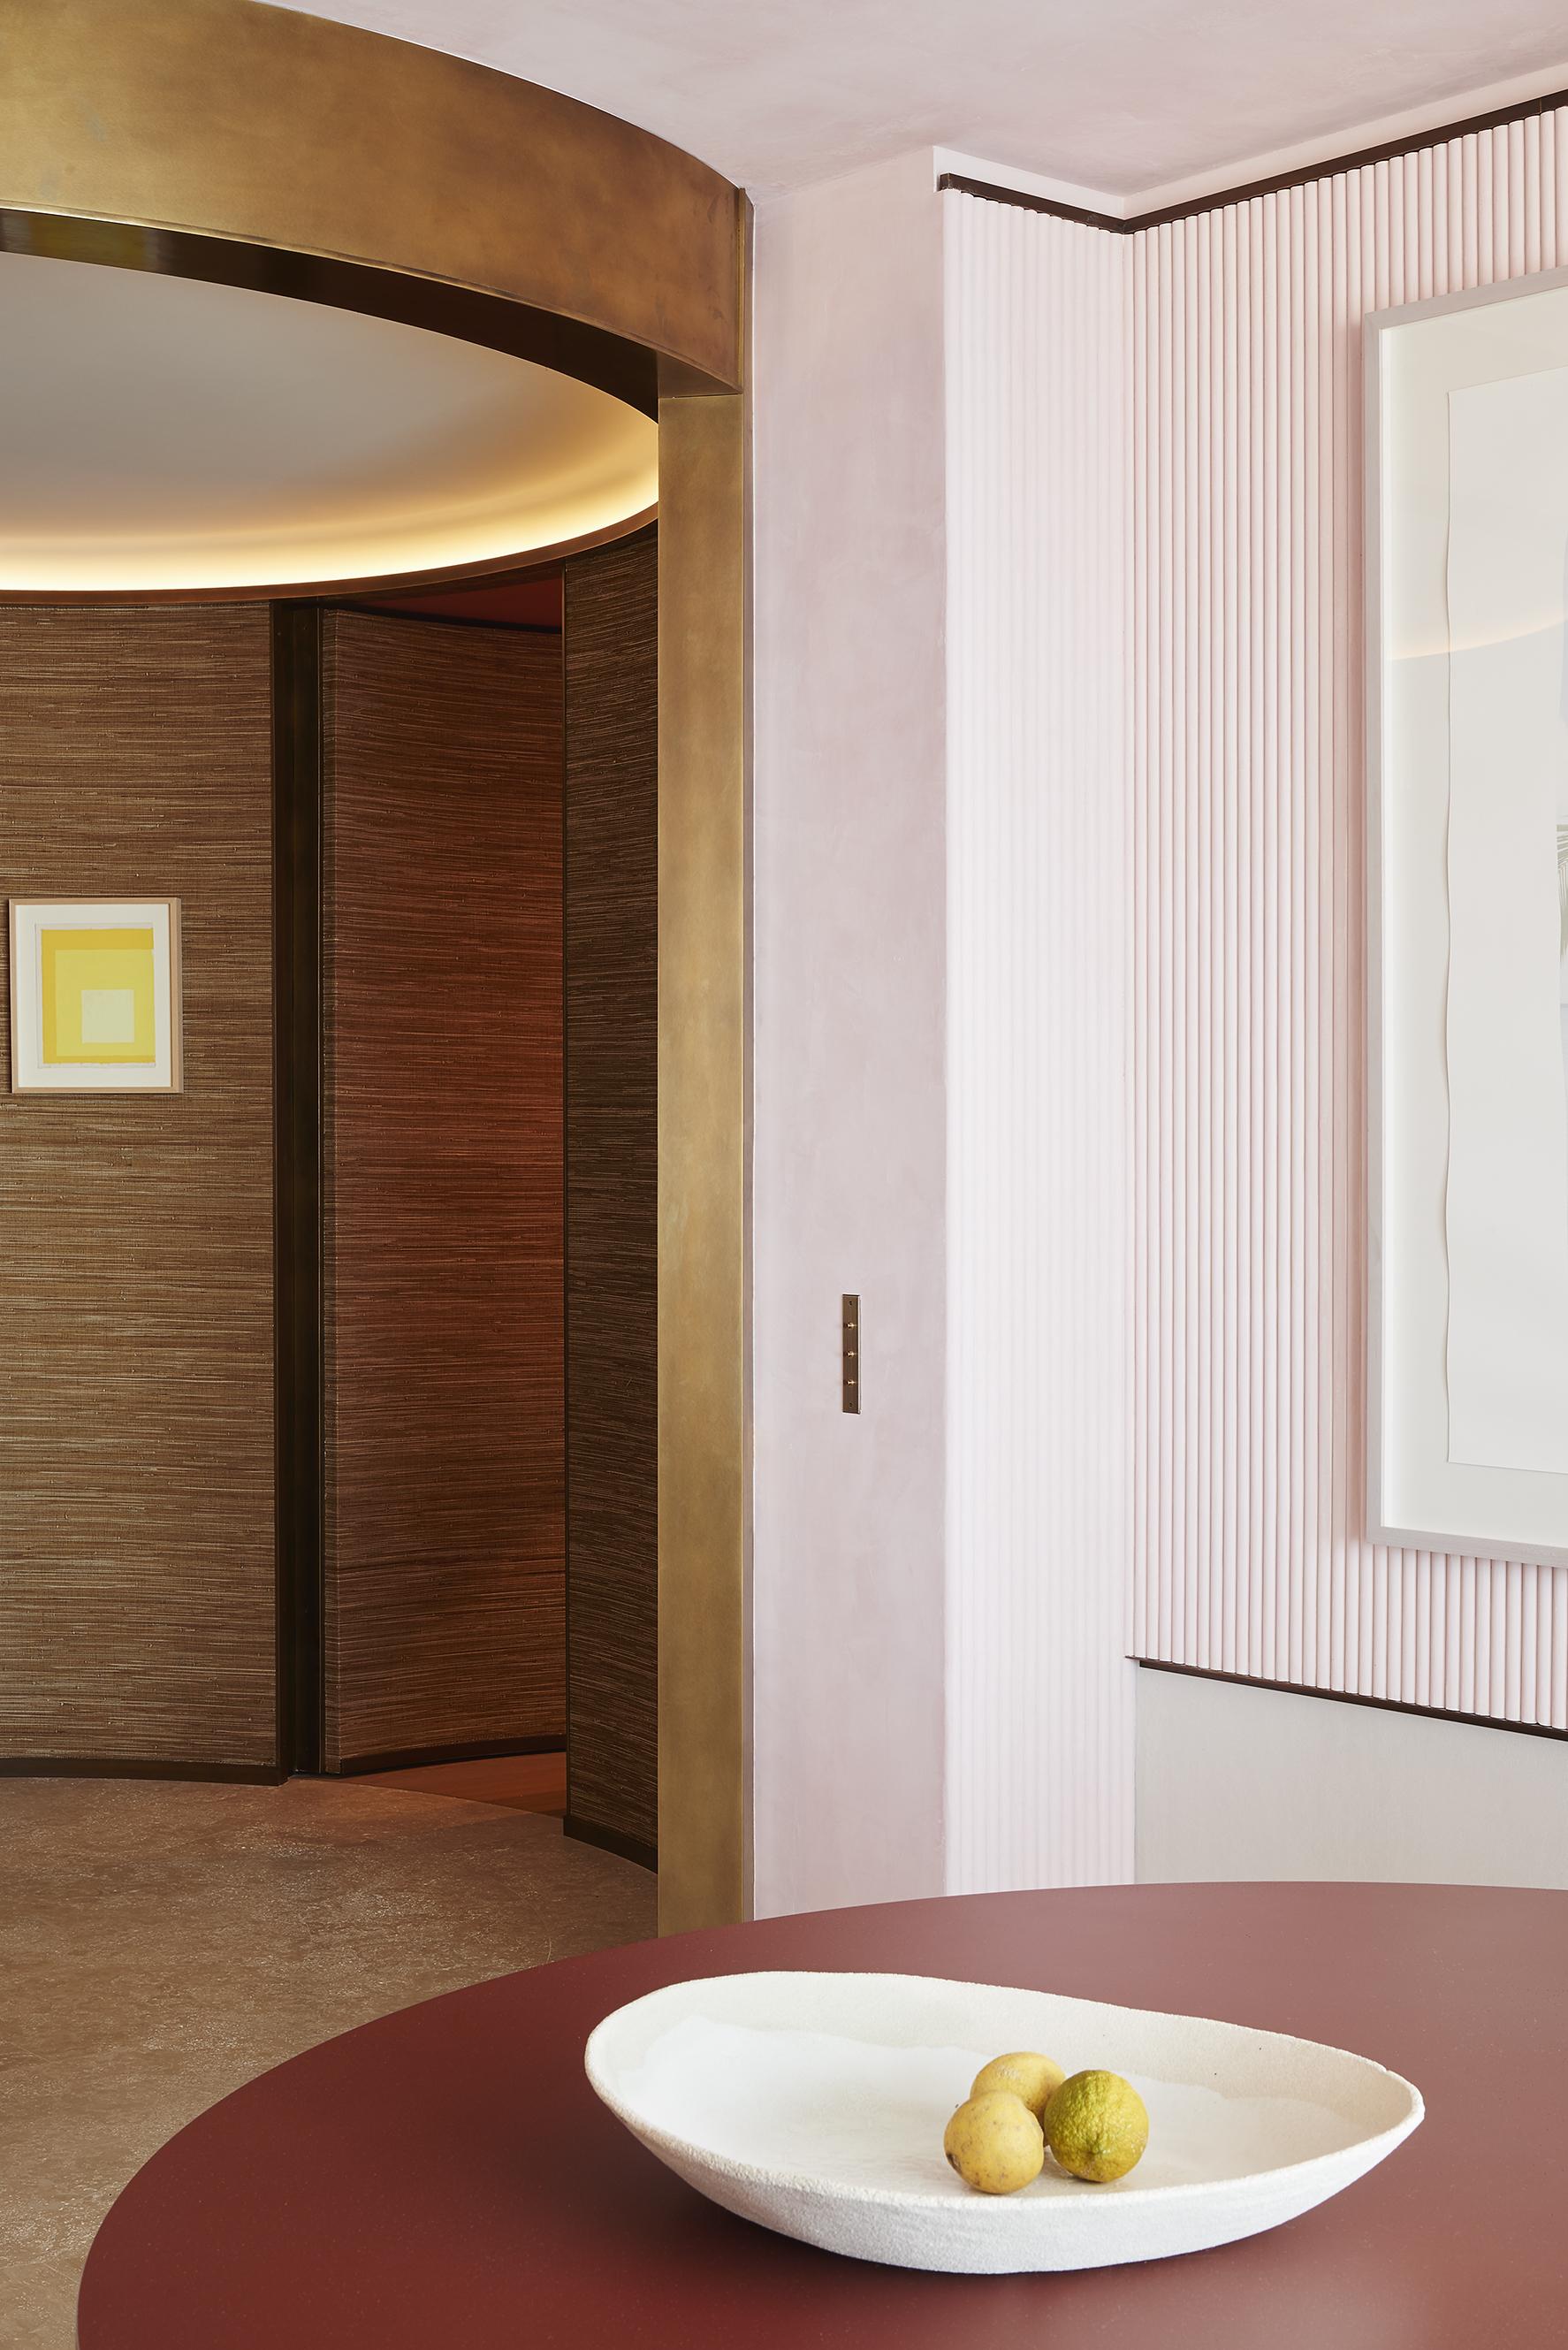 001-Rodolphe_Parente_Appartement_Sud